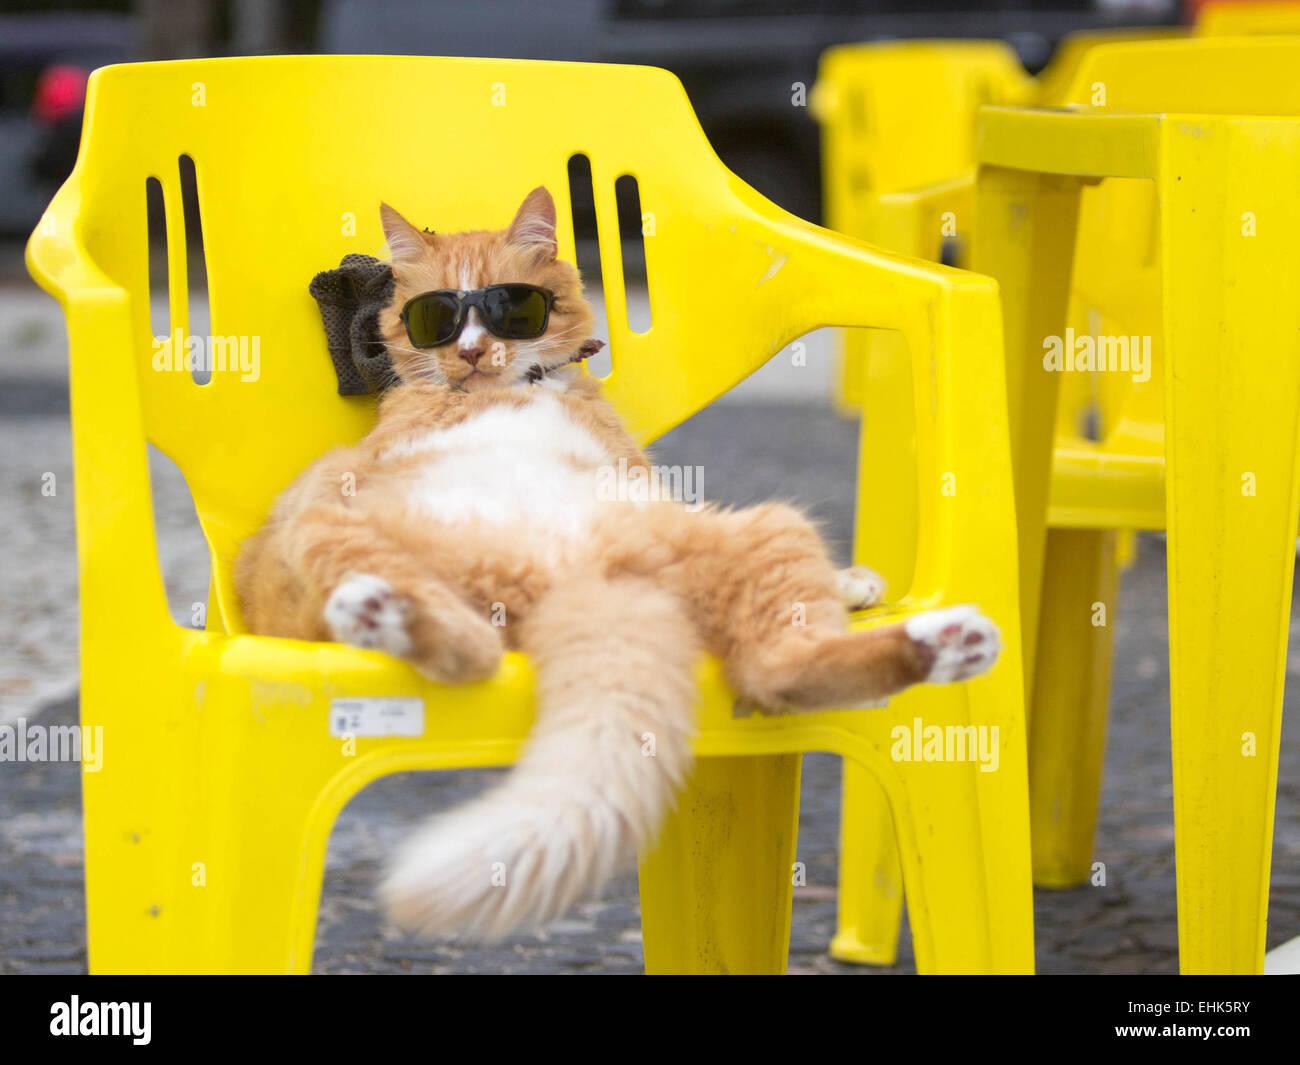 Beijing, Brazil. 14th Mar, 2015. A cat with sunglasses enjoys the sunshine in a chair near the Sao Conrado beach Stock Photo